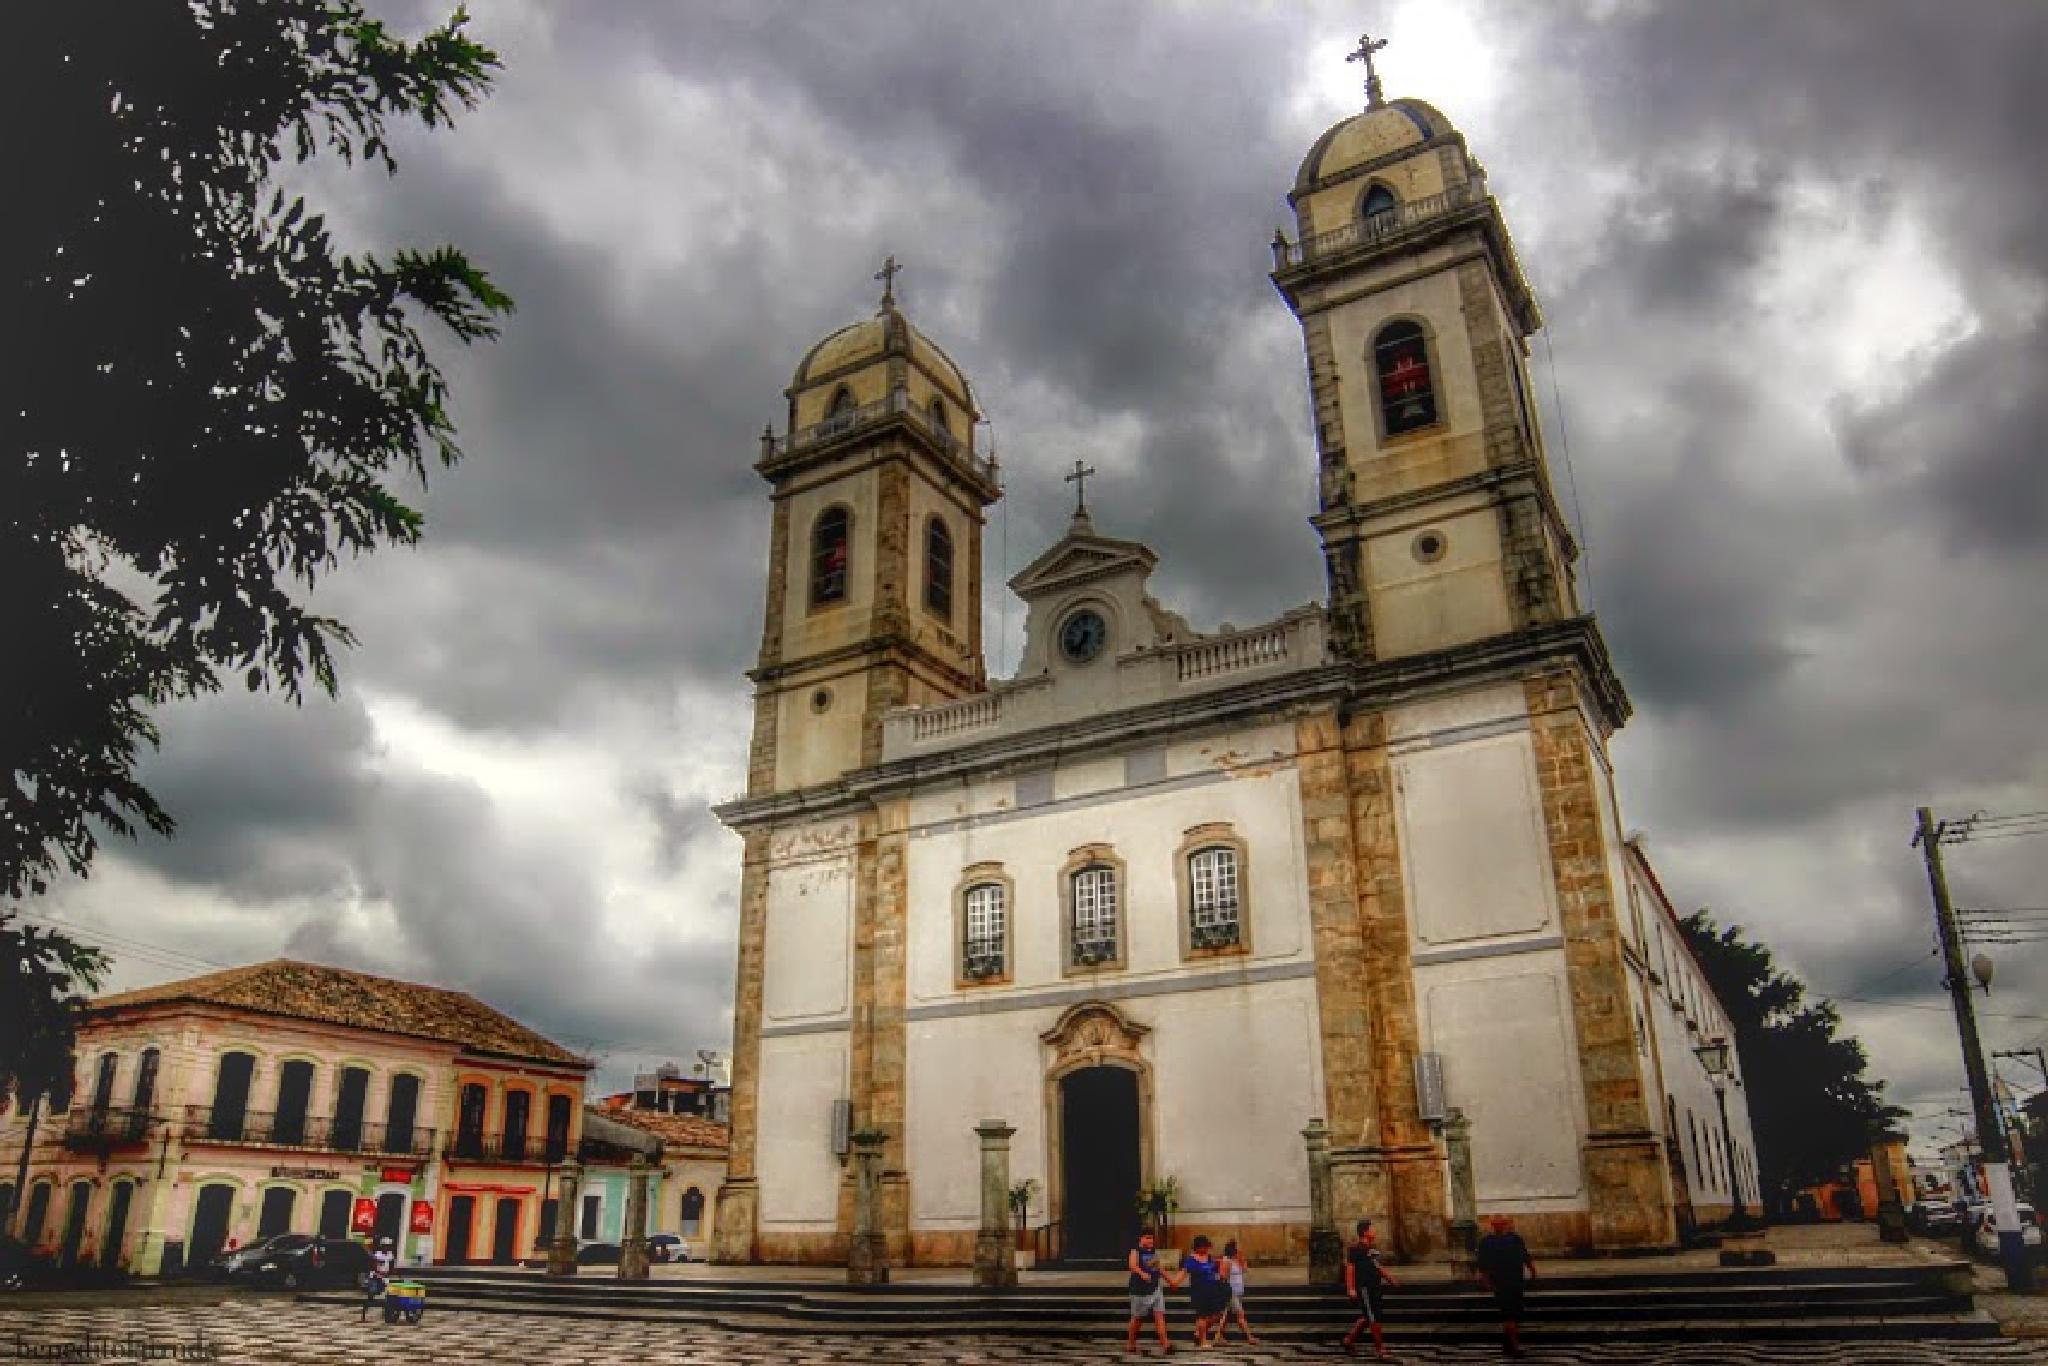 The Church by BenArr